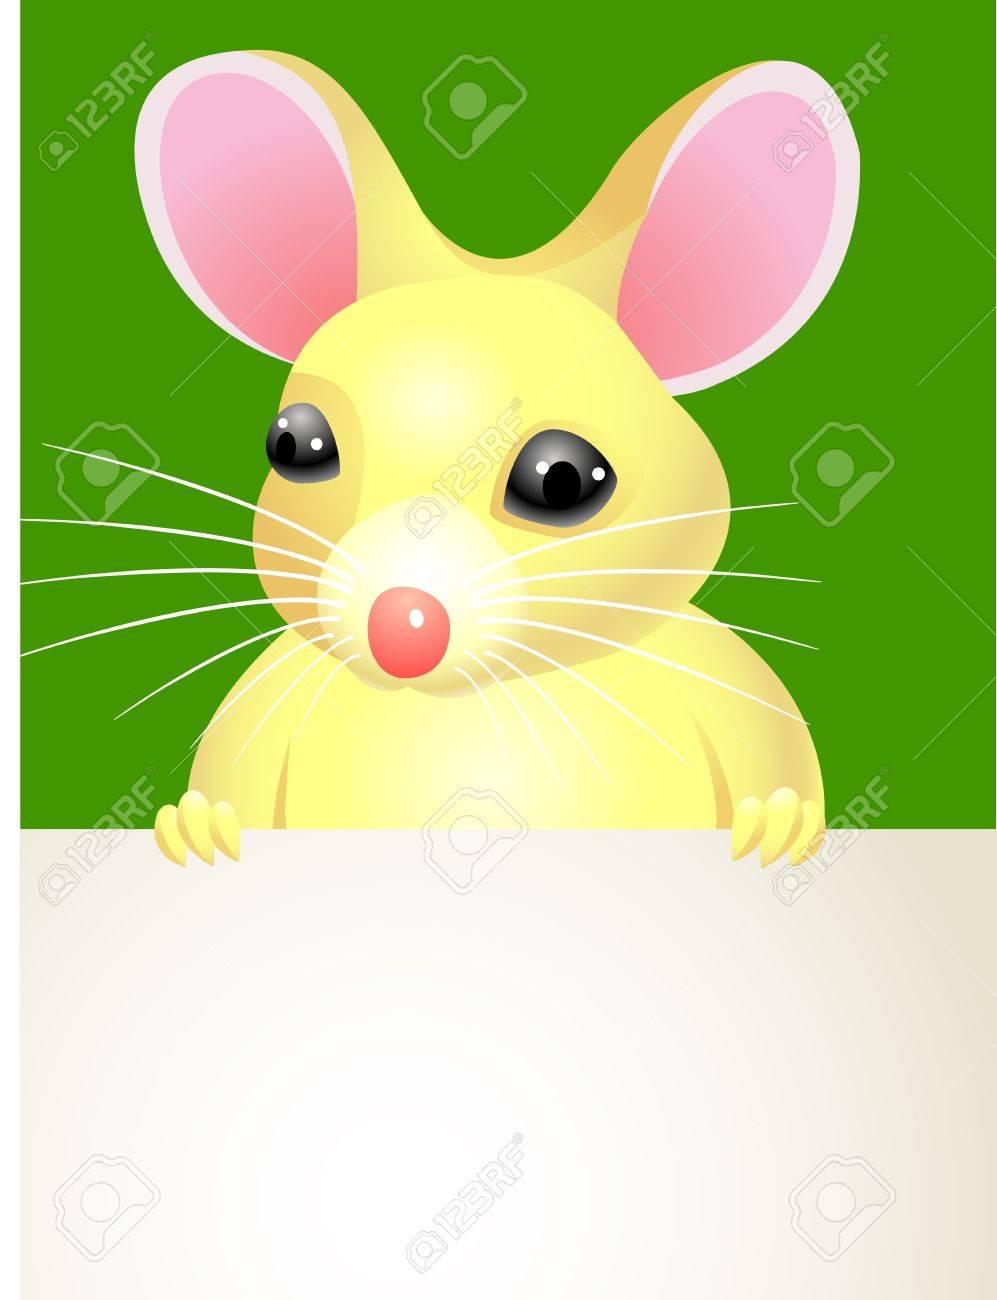 A cartoon mouse holding a blank sign Stock Vector - 13446435